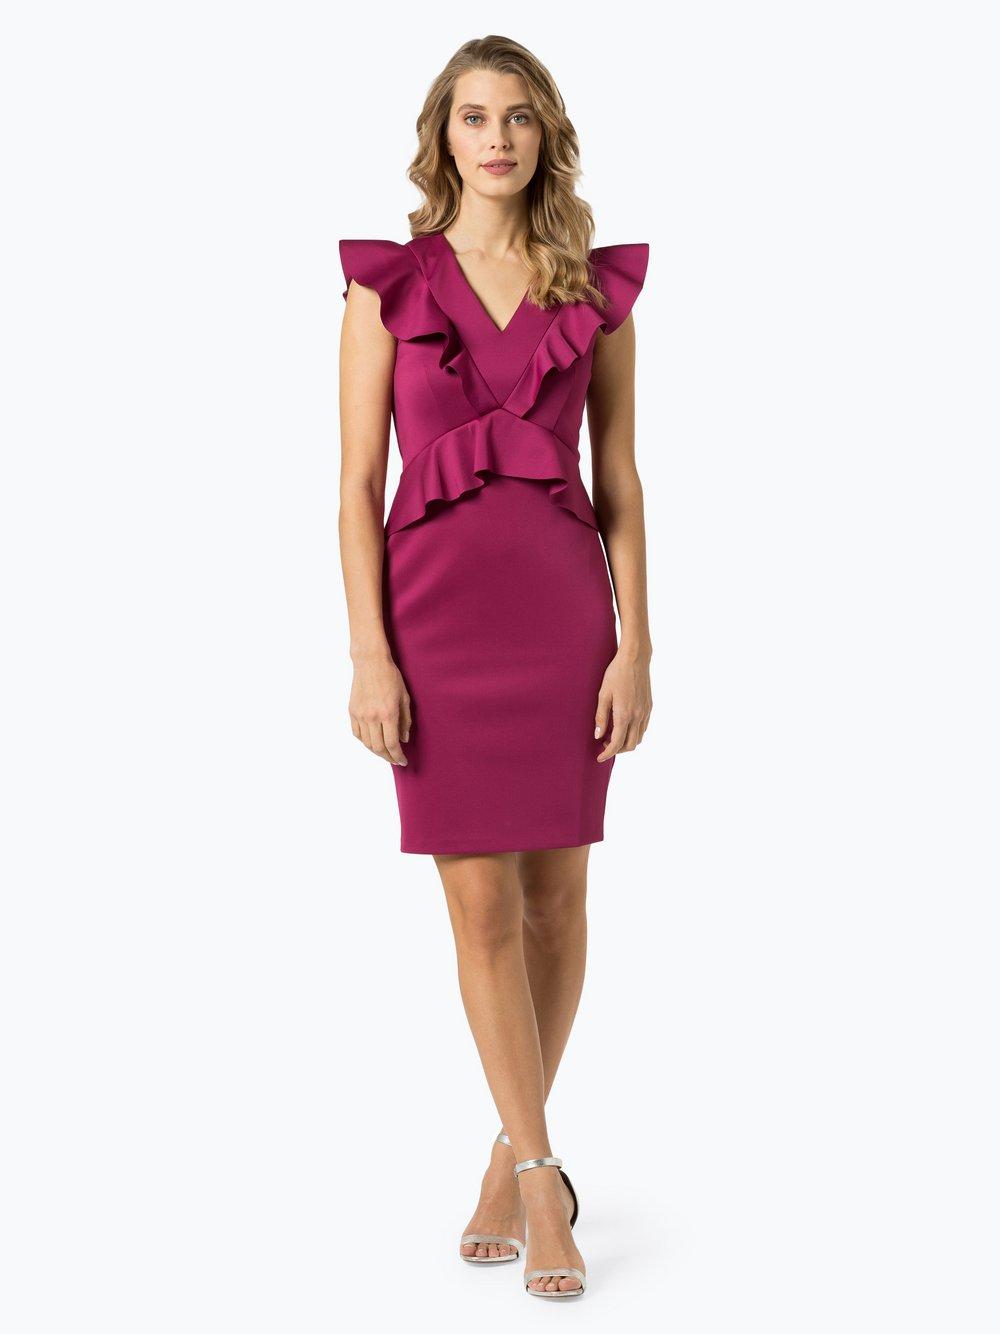 c434eaf37ac8a5 Ted Baker Damen Kleid - Alair online kaufen